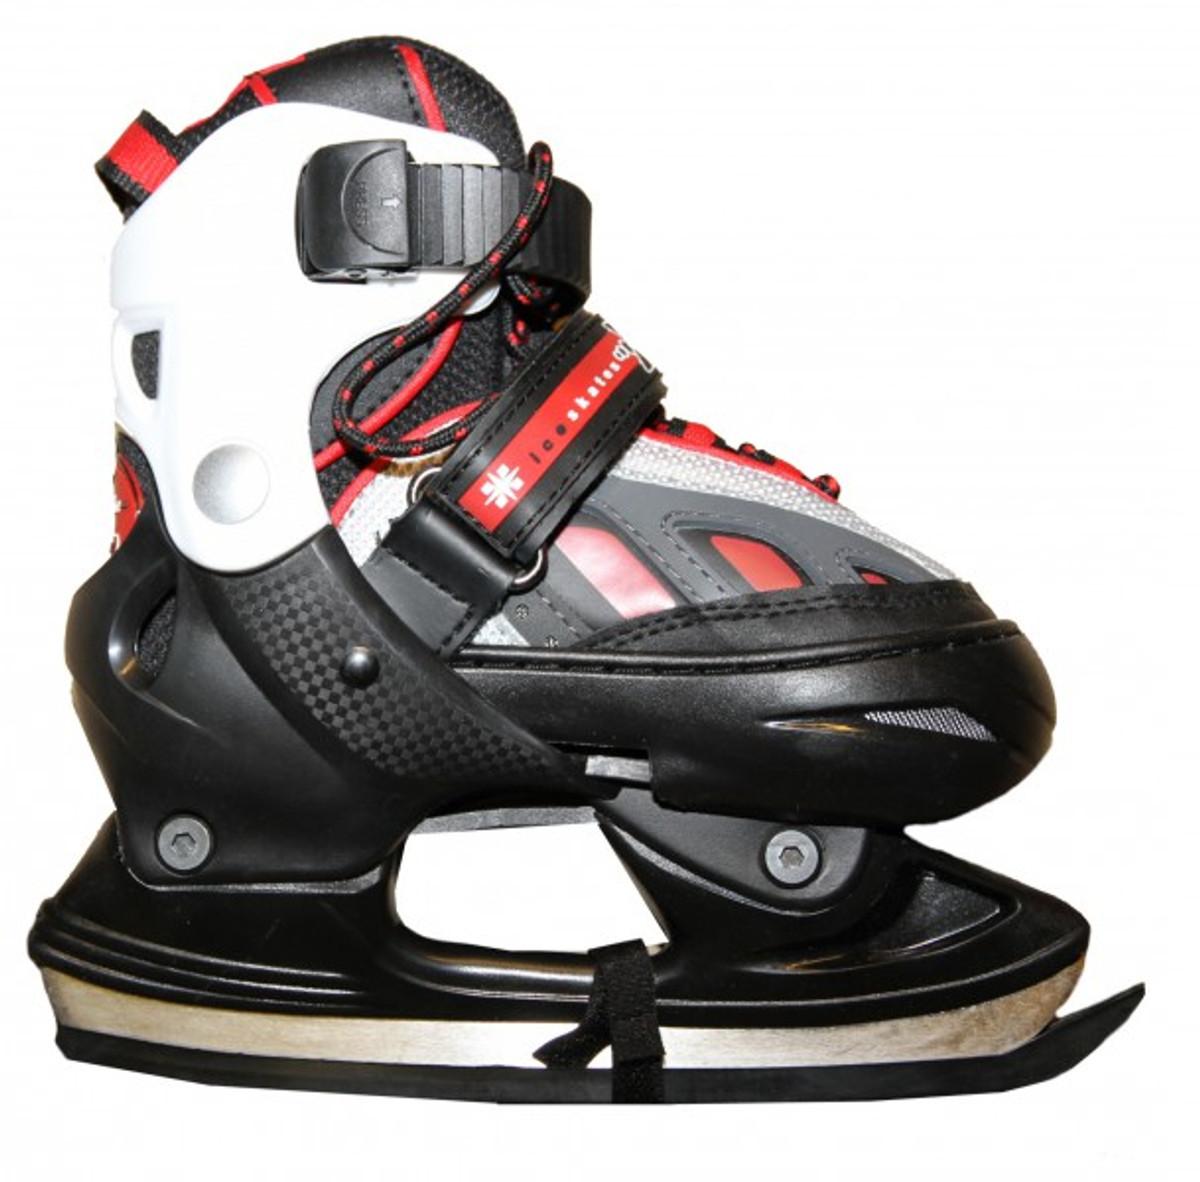 Hudora Xpulse Schlittschuhe Ice Skates Black/Red/White ...